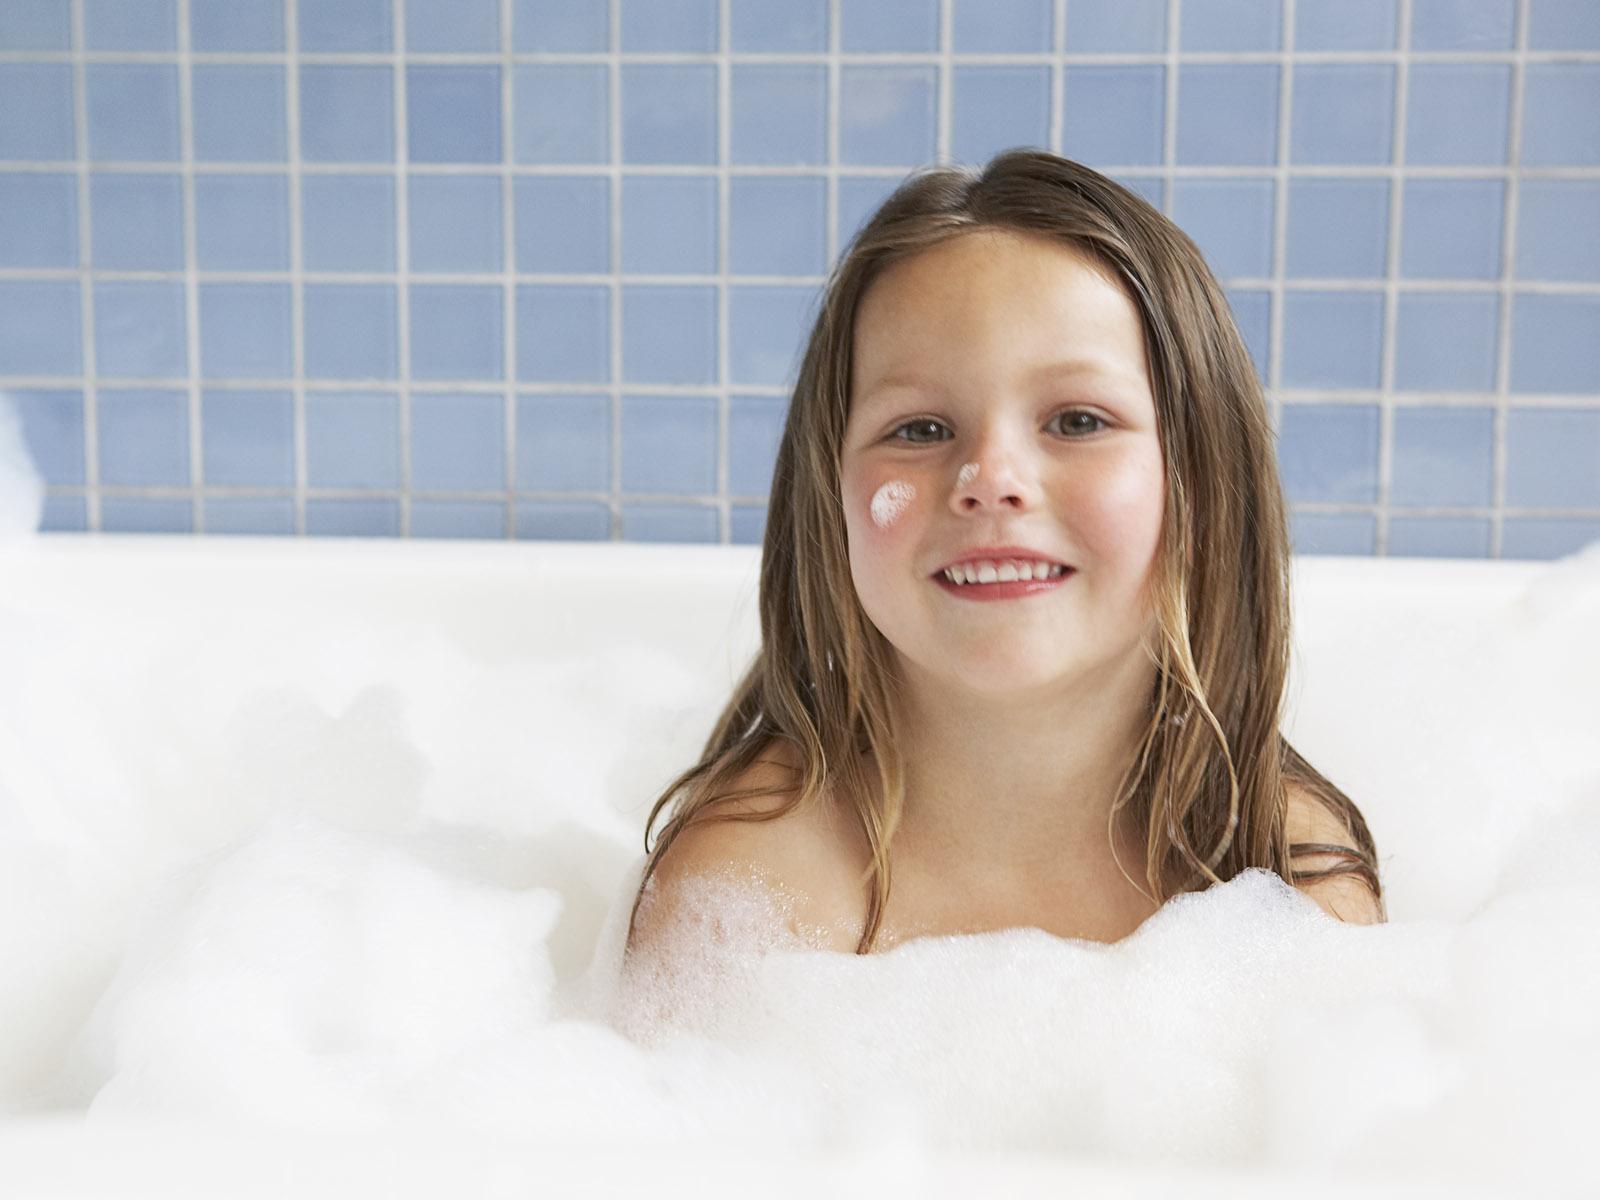 bathing-a-young-teen-malik-fauck-photos